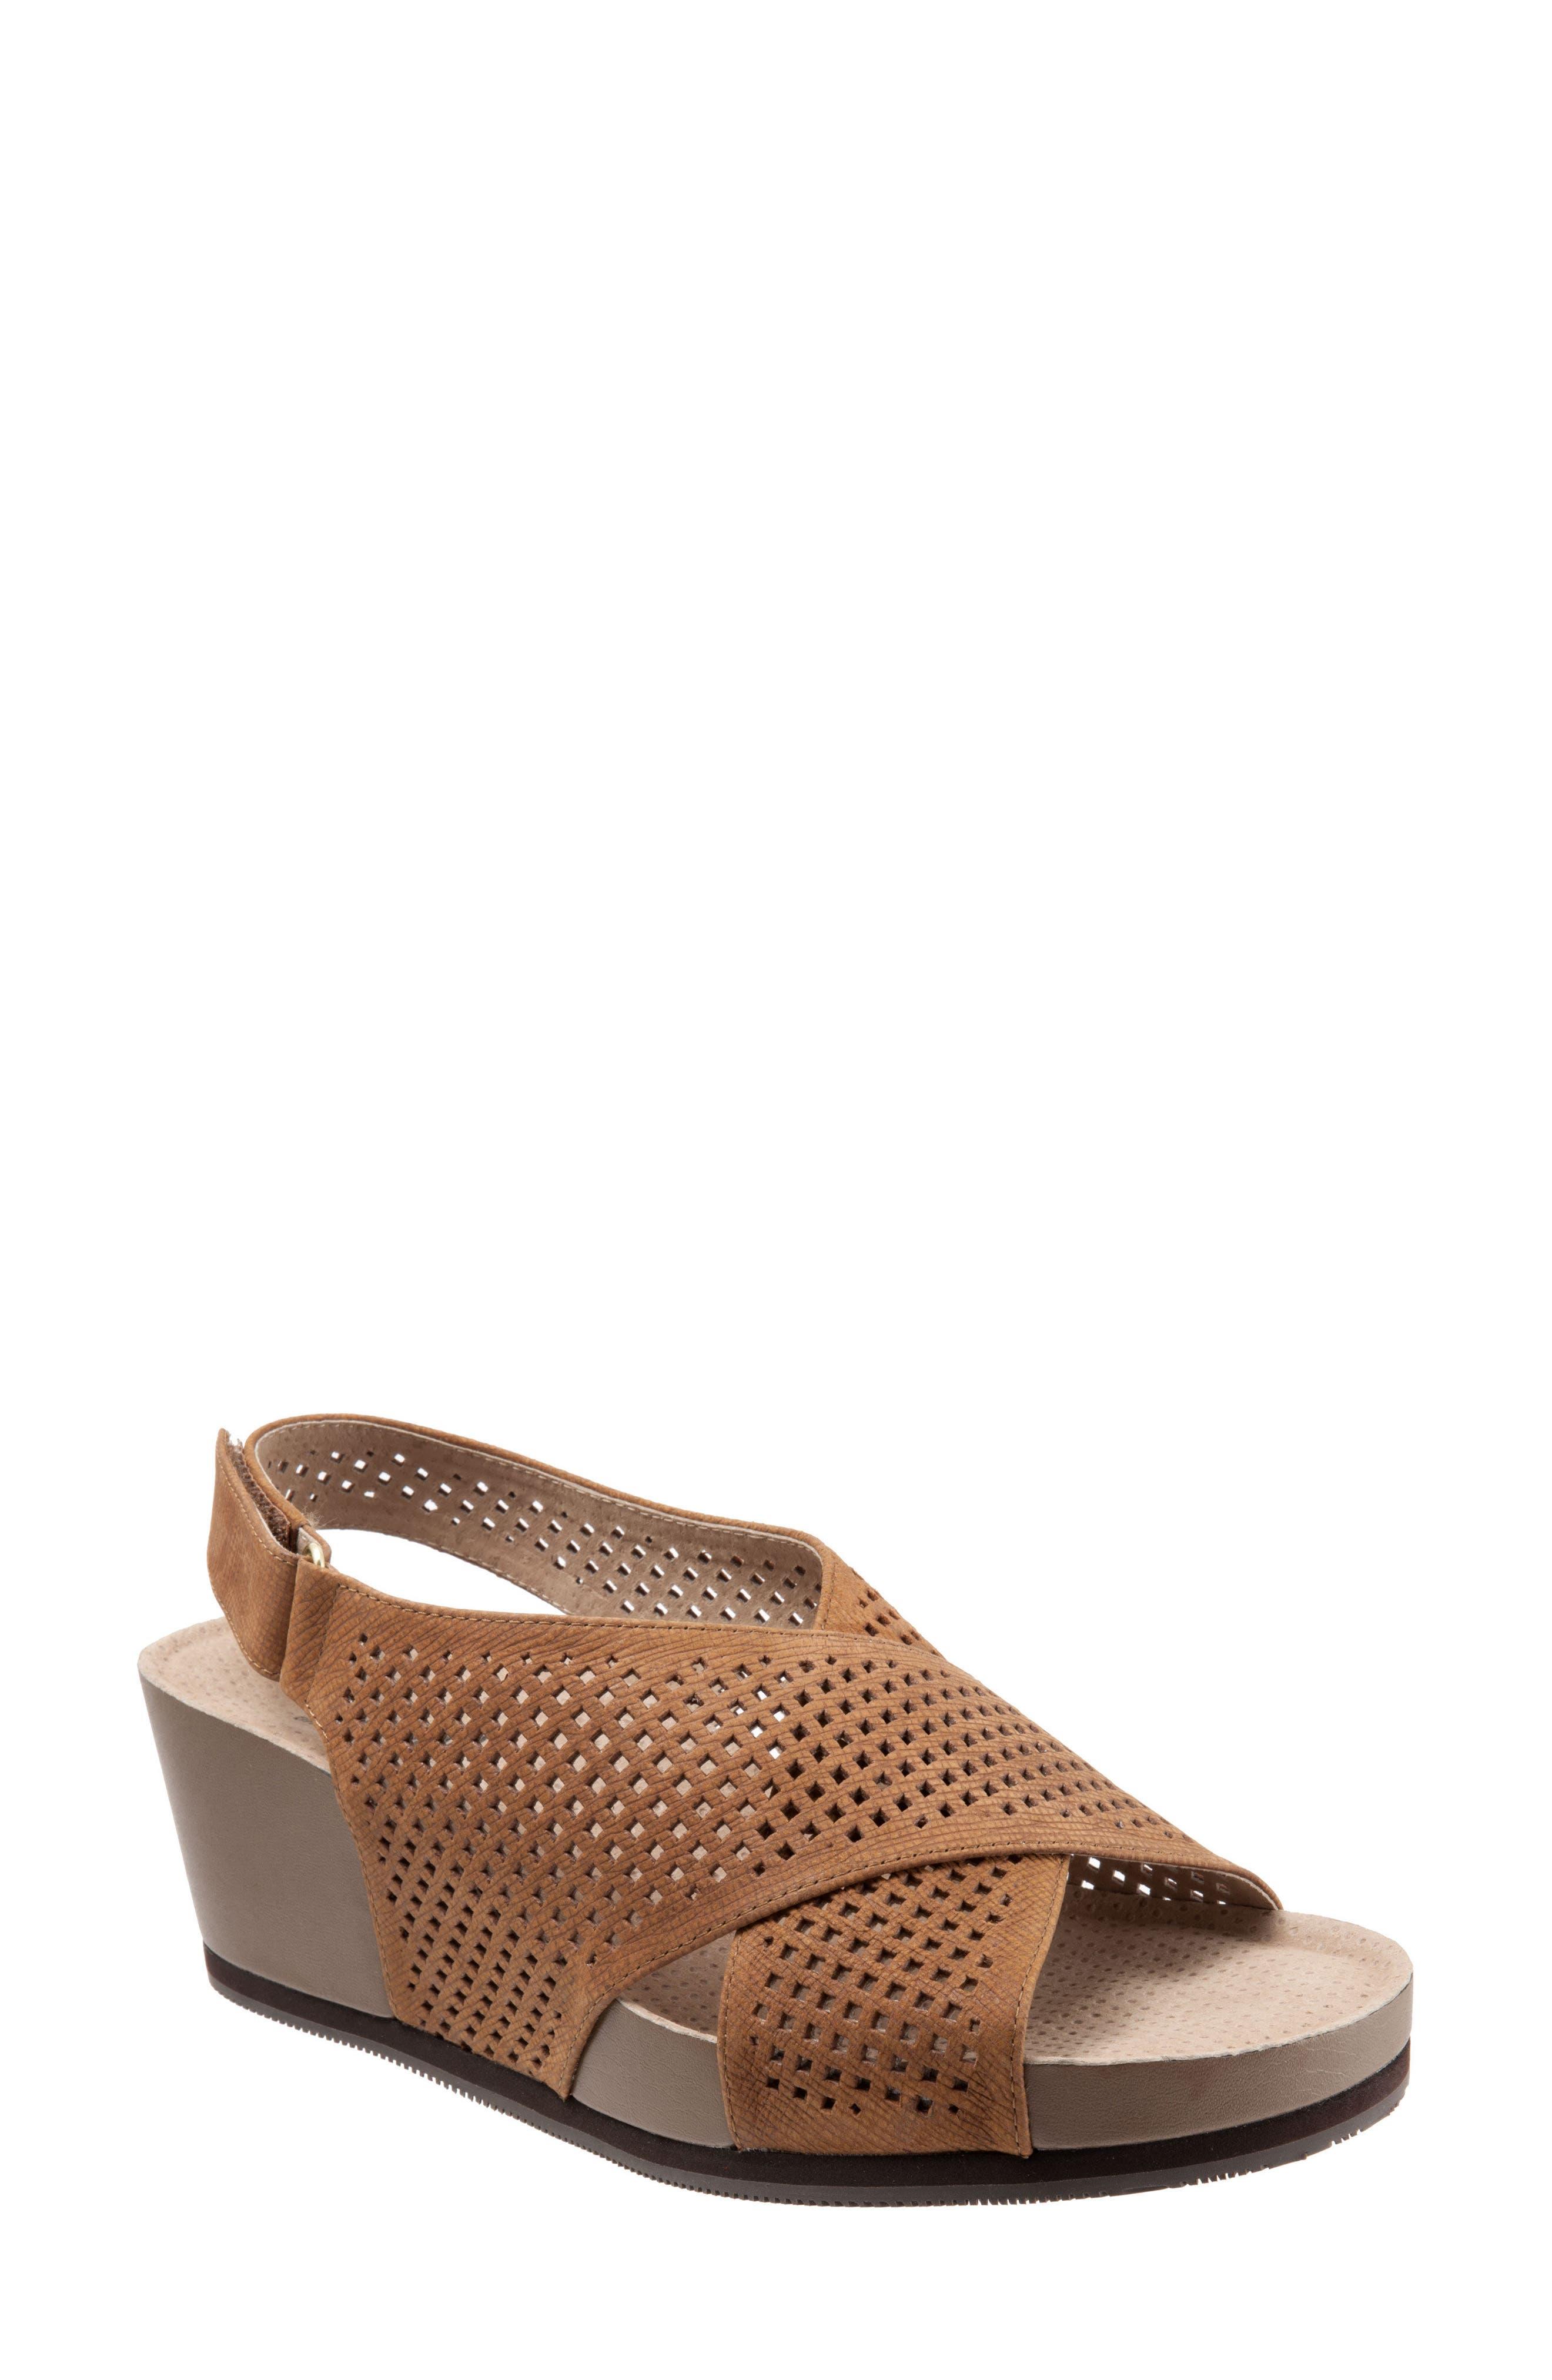 Alternate Image 1 Selected - SoftWalk® Hansford Wedge Sandal (Women)